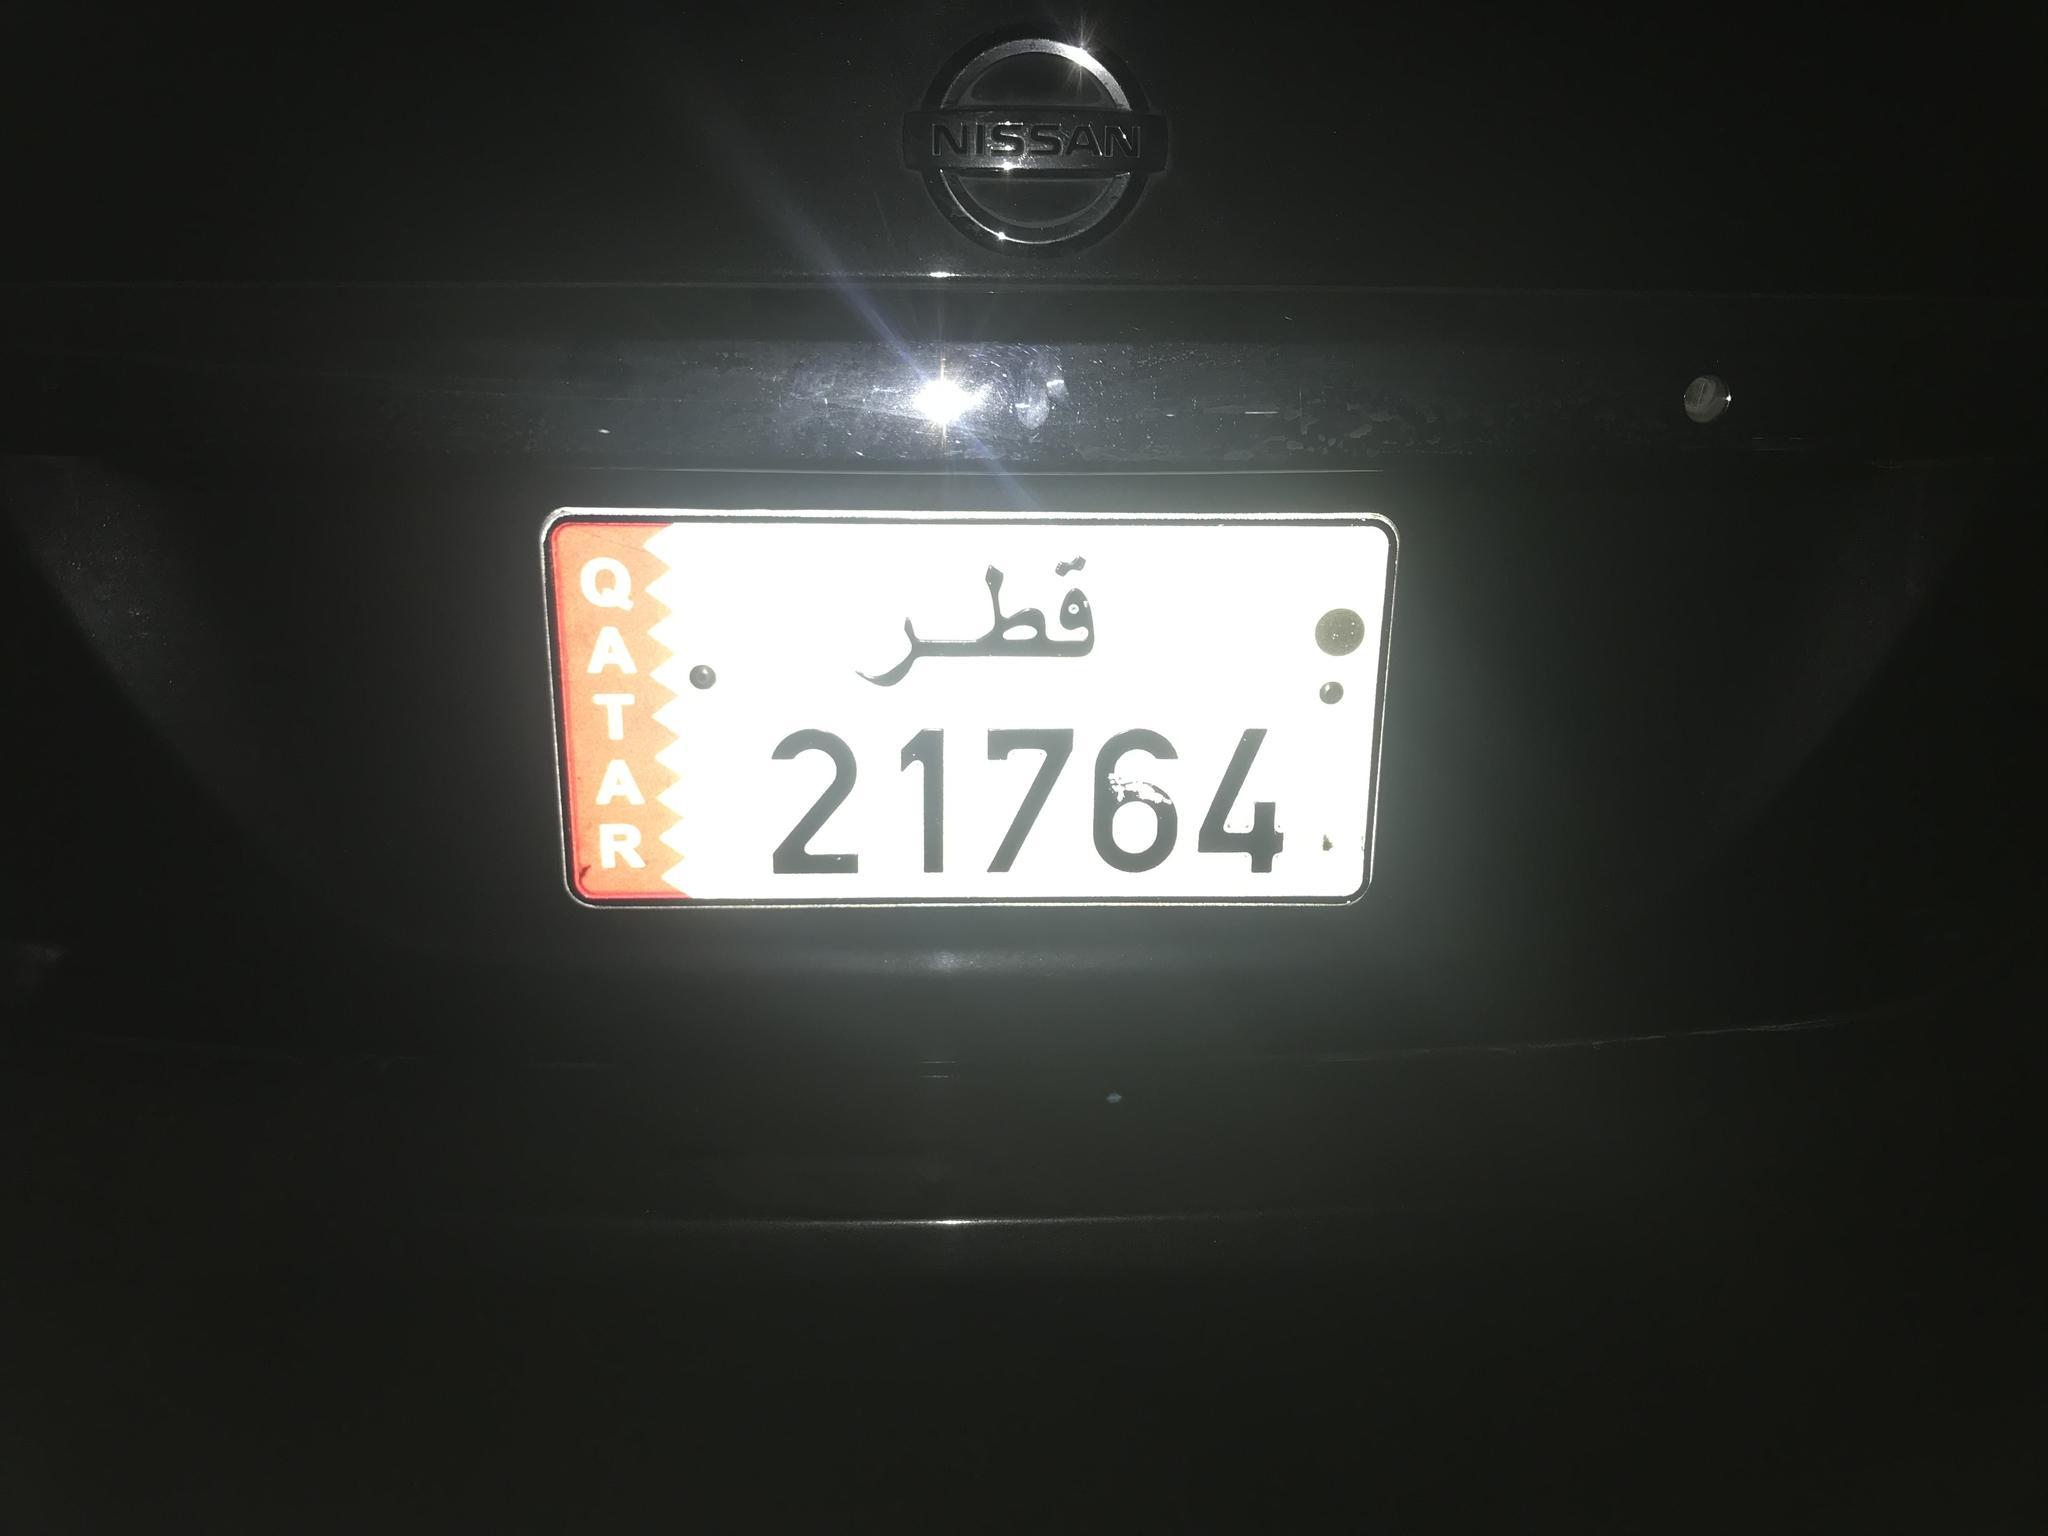 5 digit number